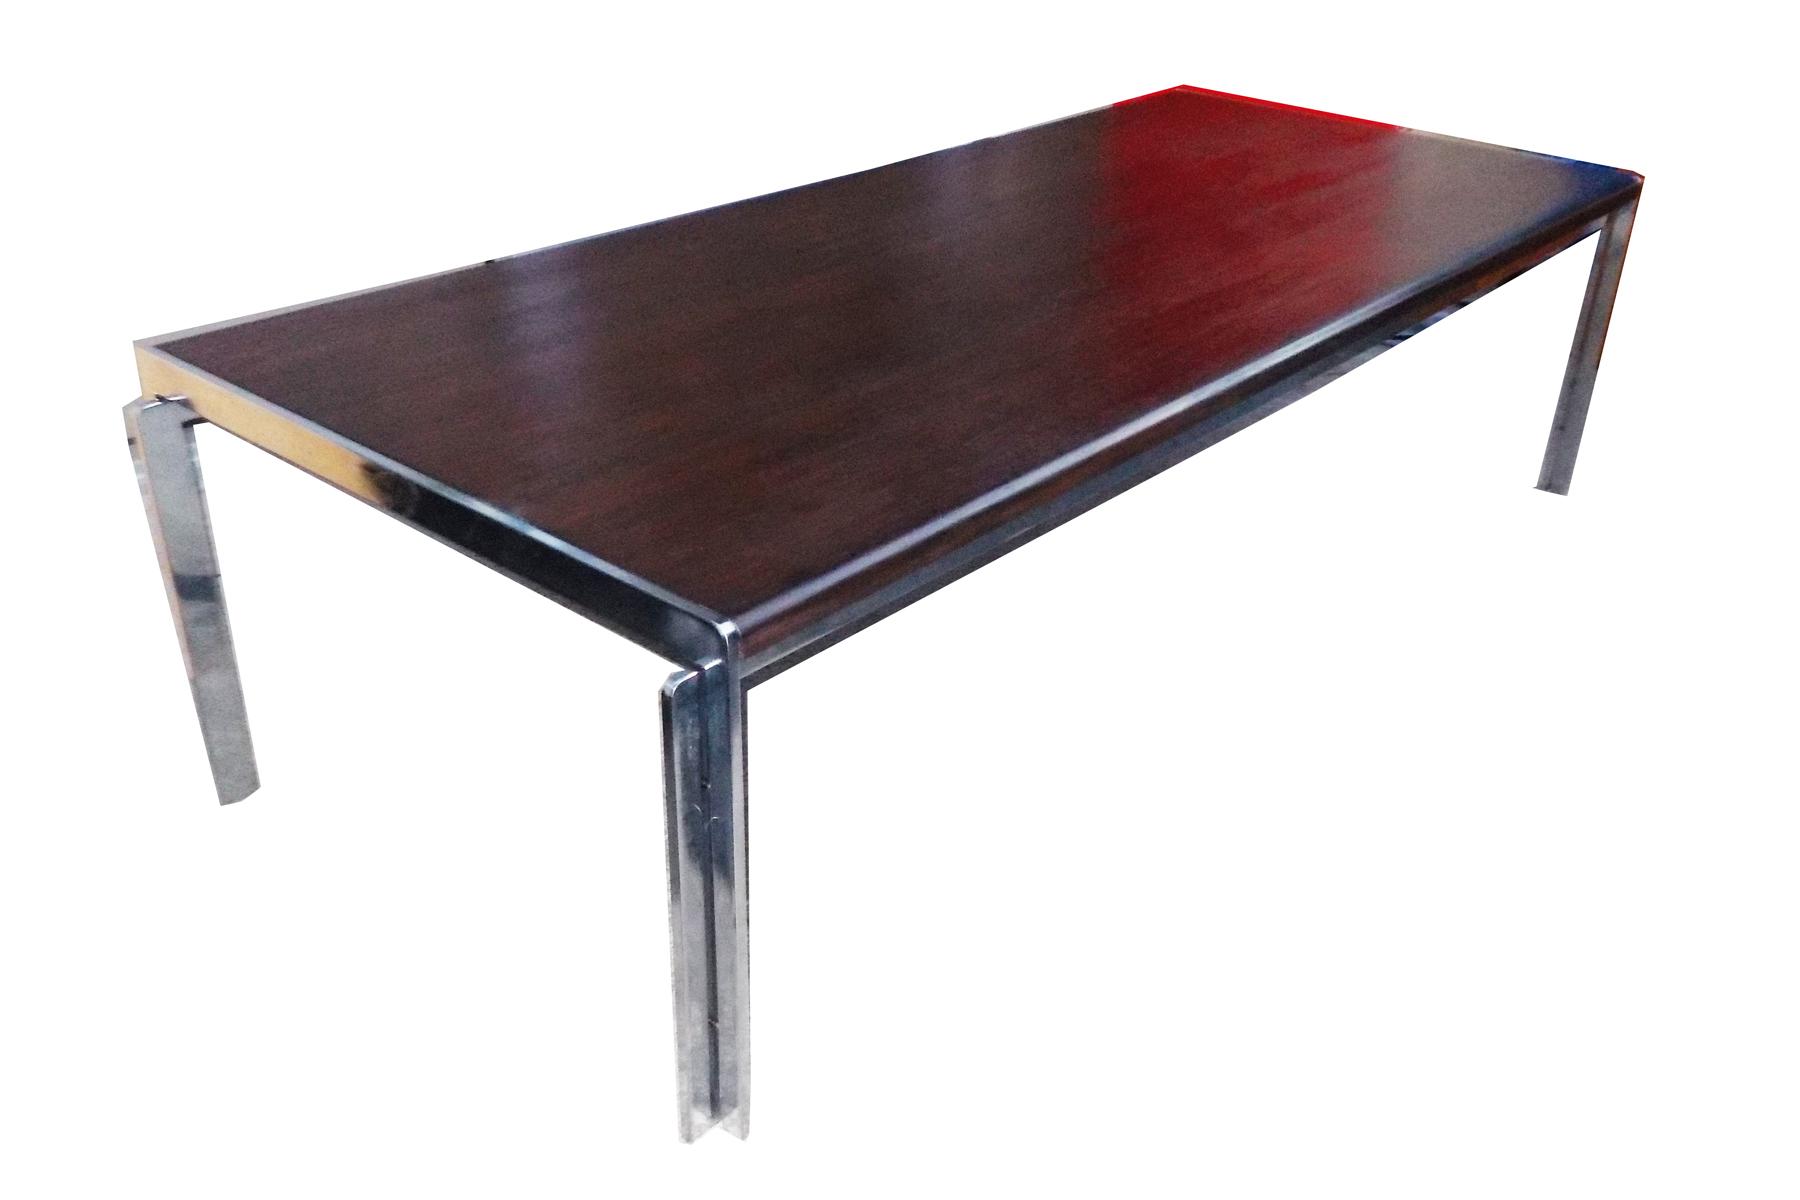 stow davis vintage wood & chrome coffee table | chairish